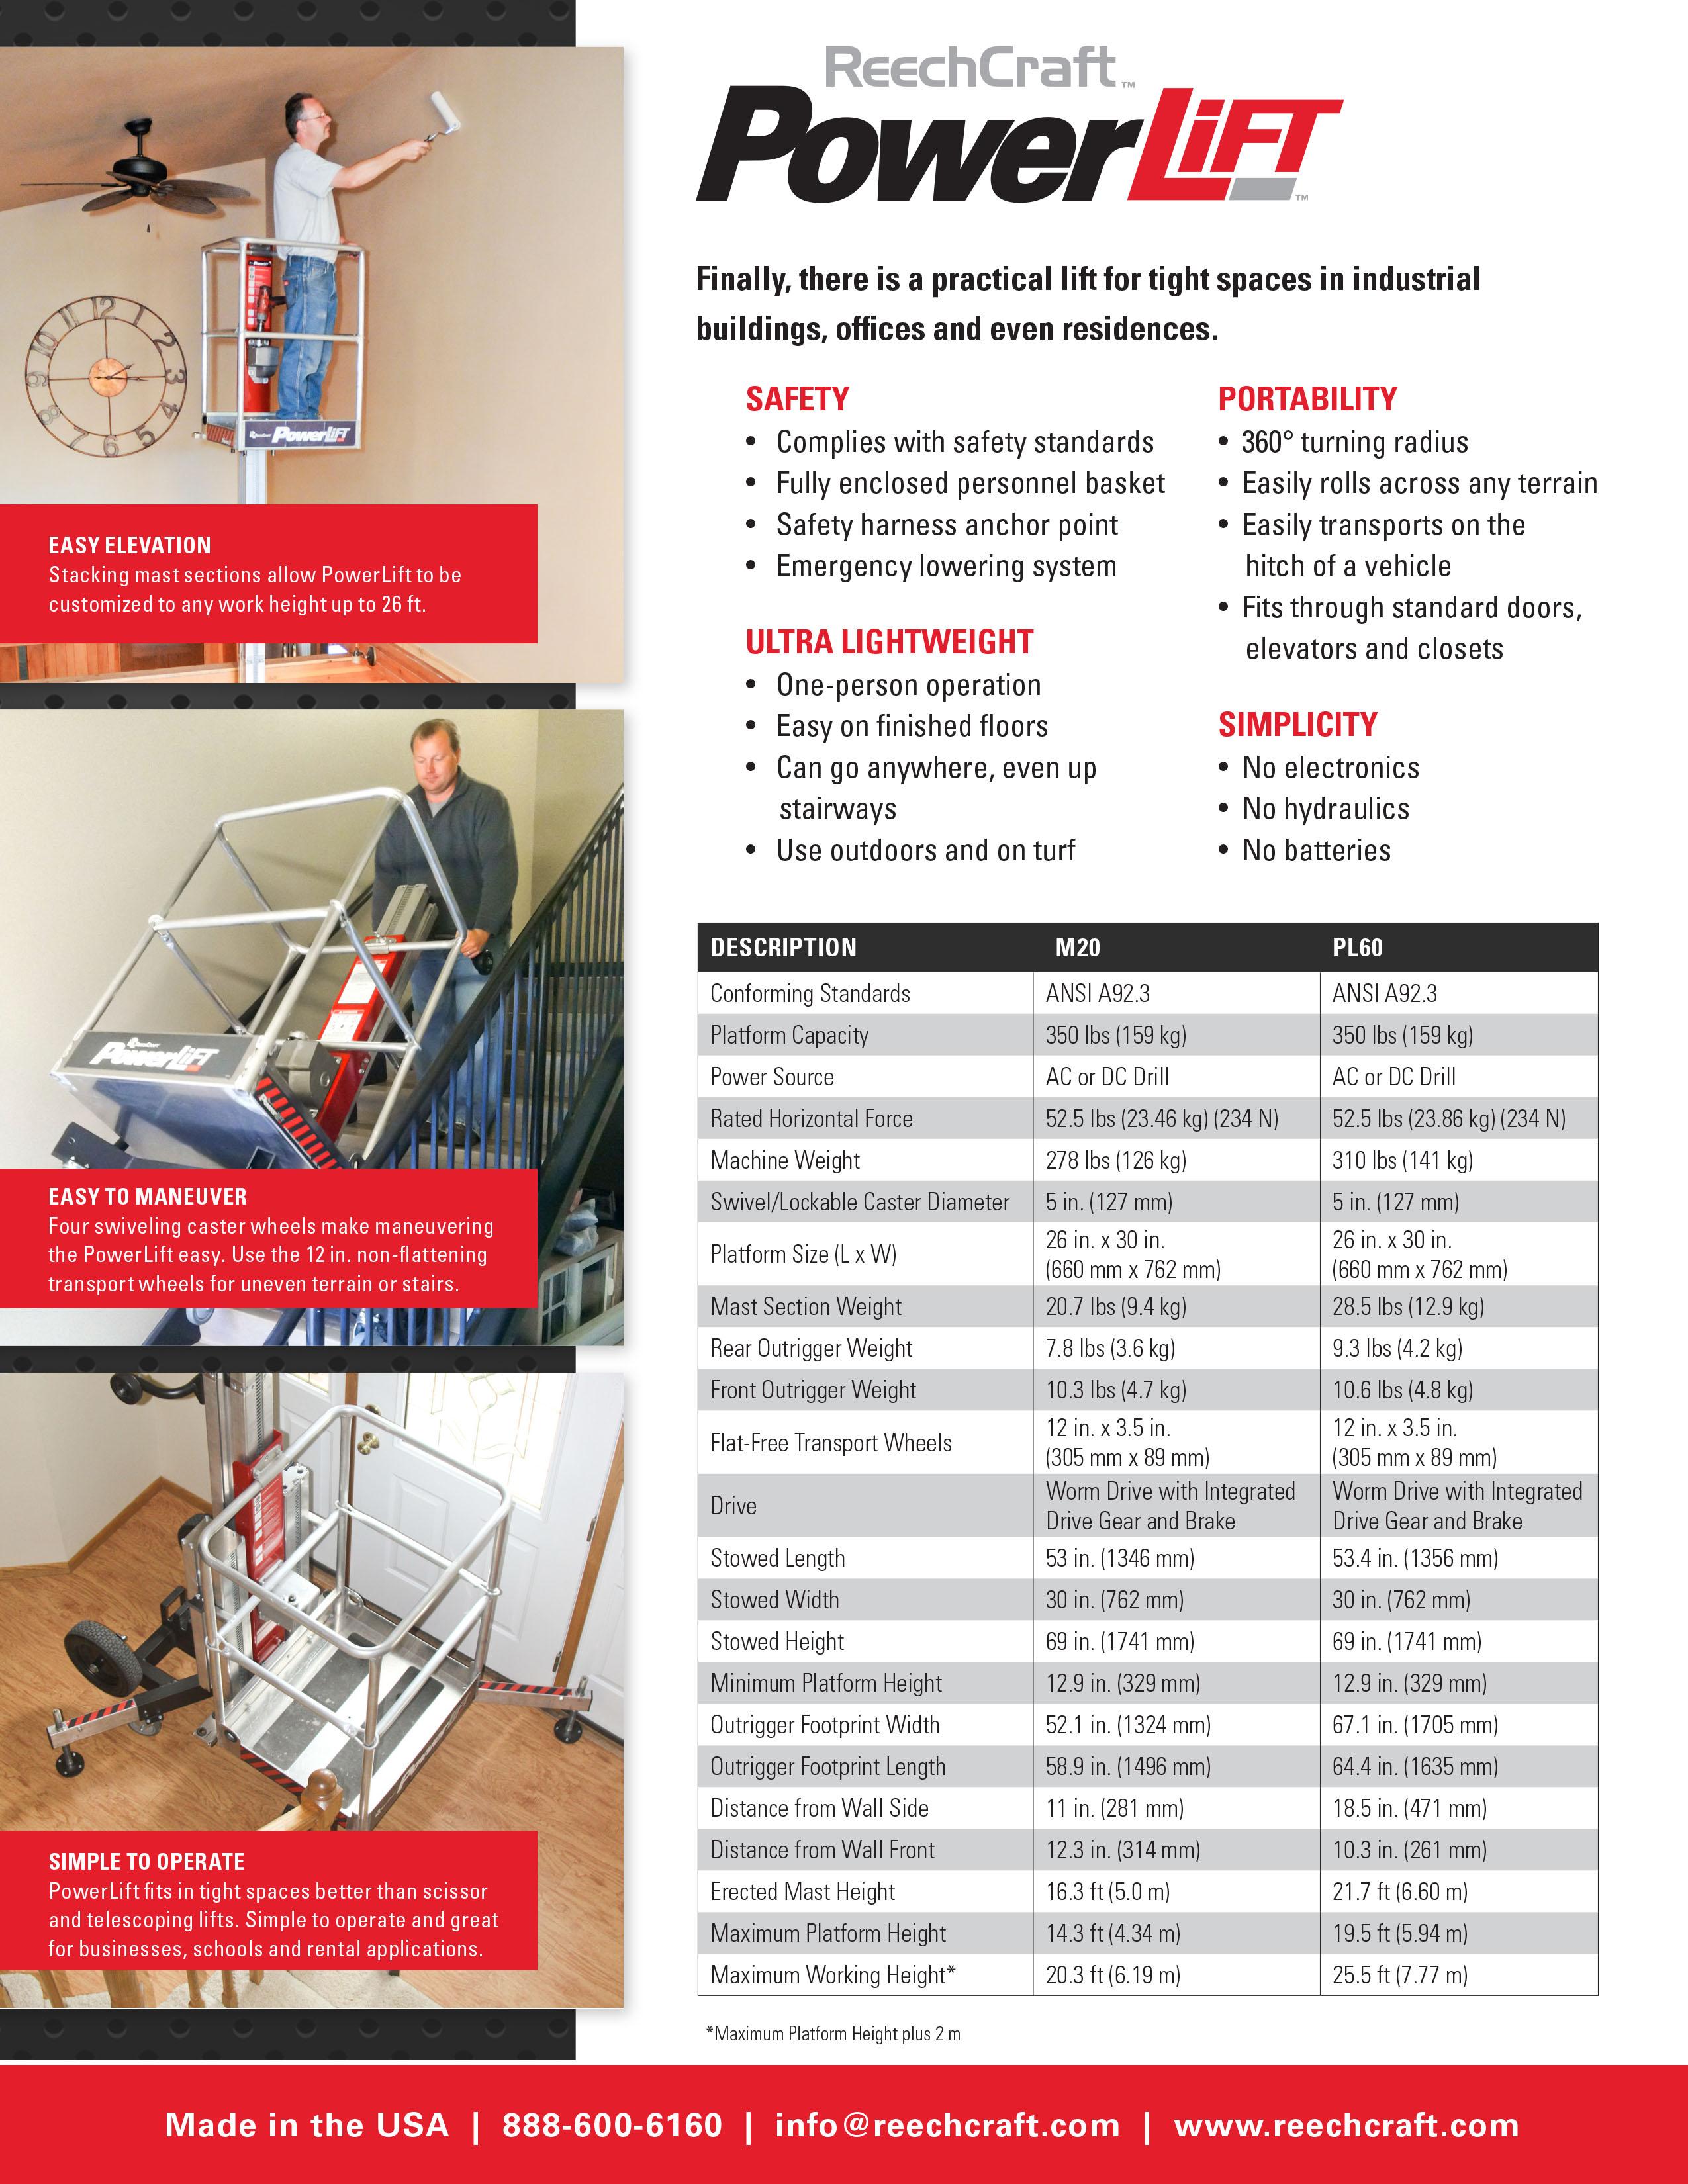 powerlift-brochure-2.jpg